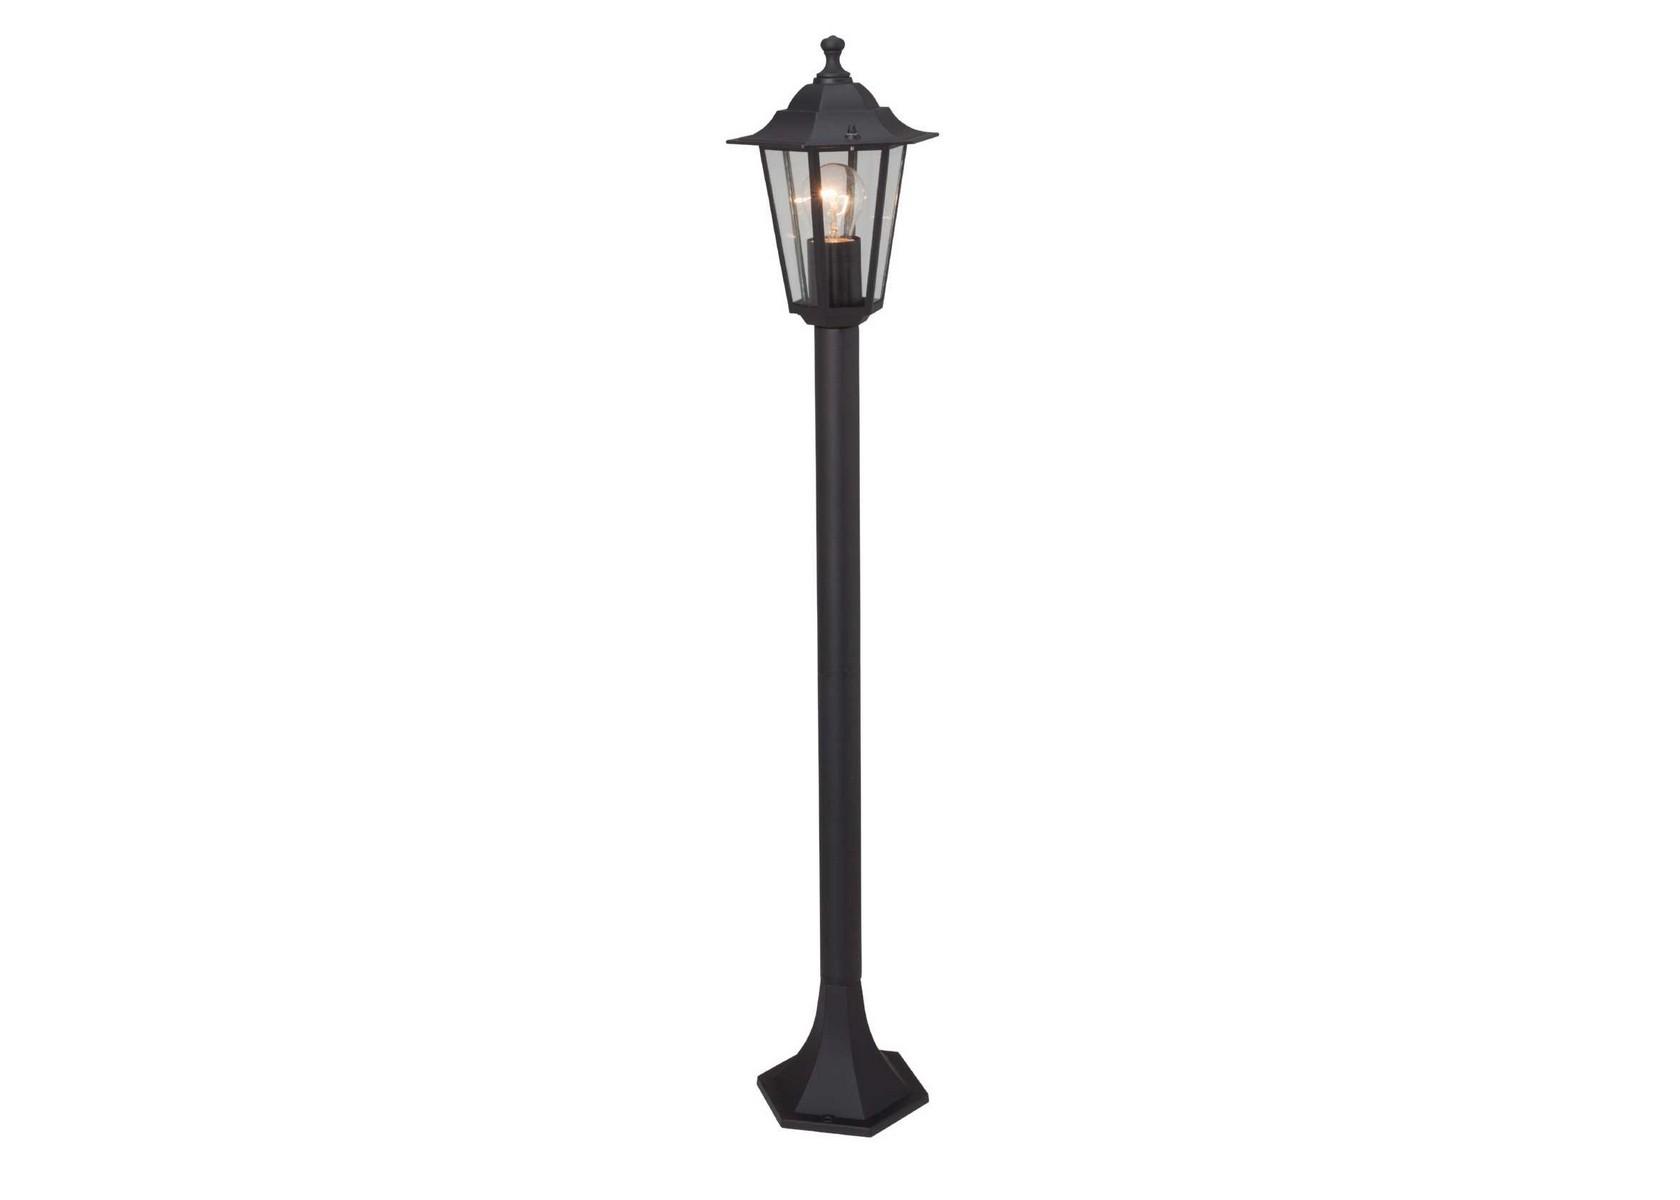 Светильник уличный CROWNУличные наземные светильники<br>Вид цоколя: Е27Мощность лампы: 60WКоличество ламп: 1Наличие ламп: нет<br><br>kit: None<br>gender: None